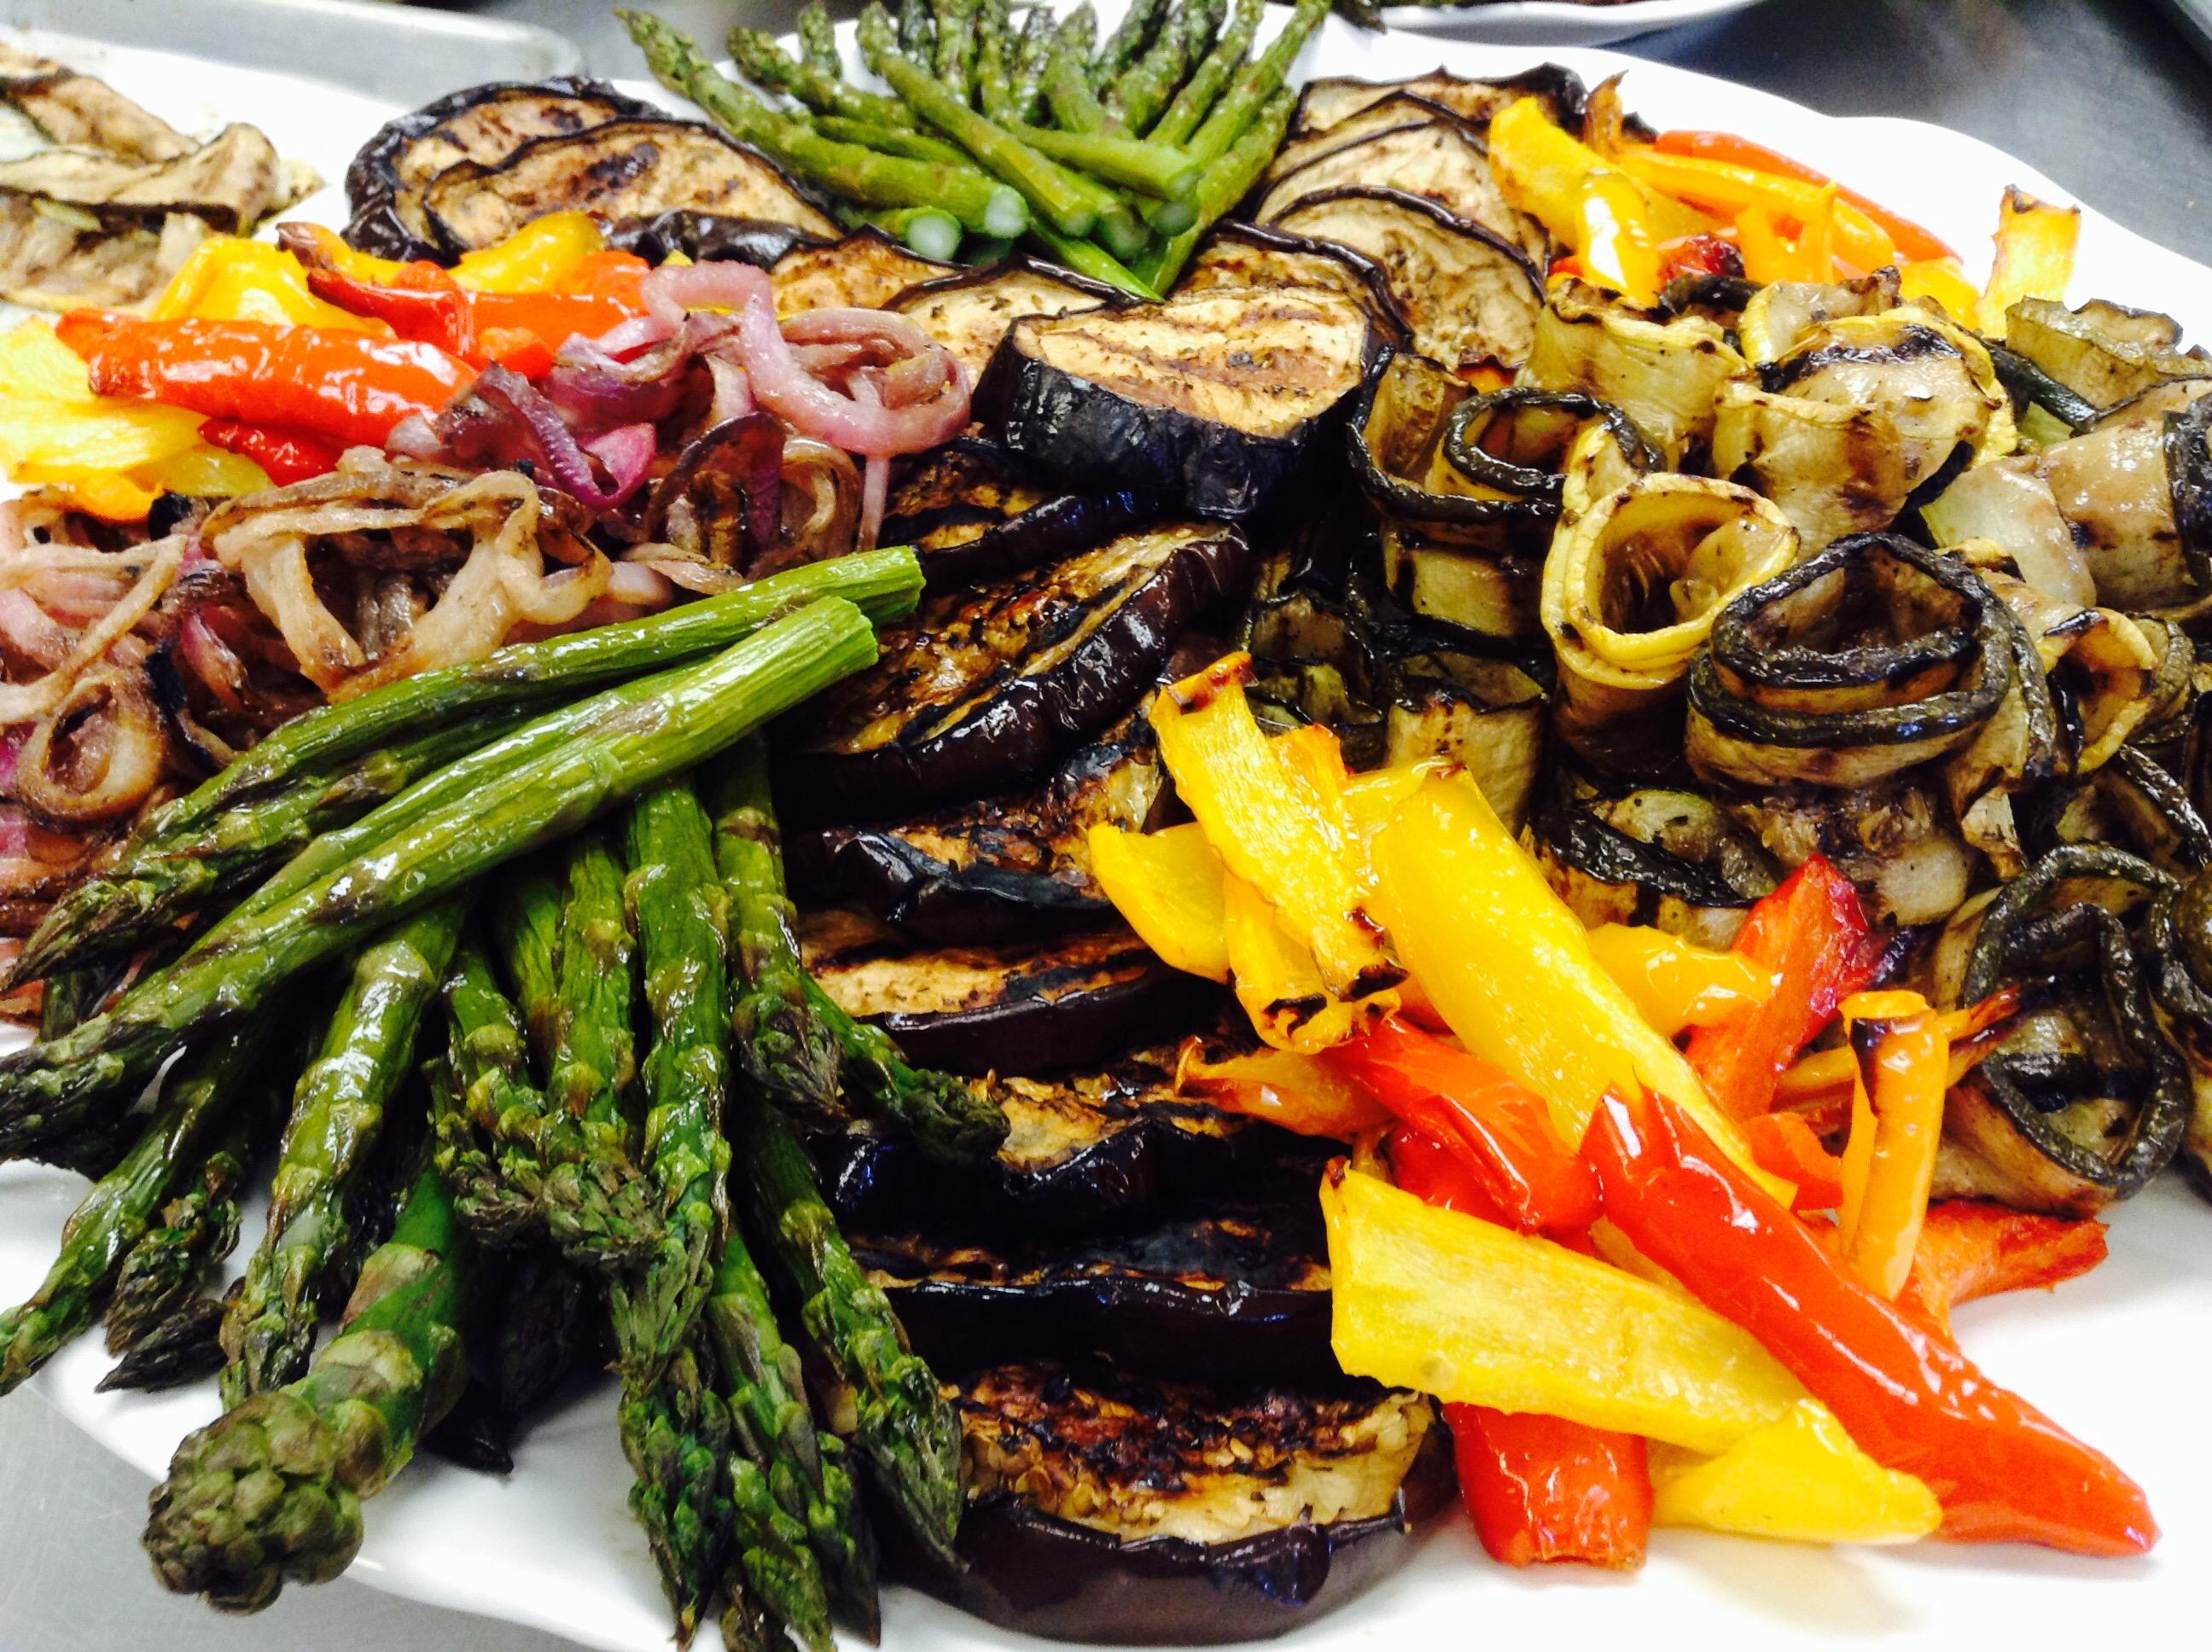 Cuisine - Pesach With Bordeaux